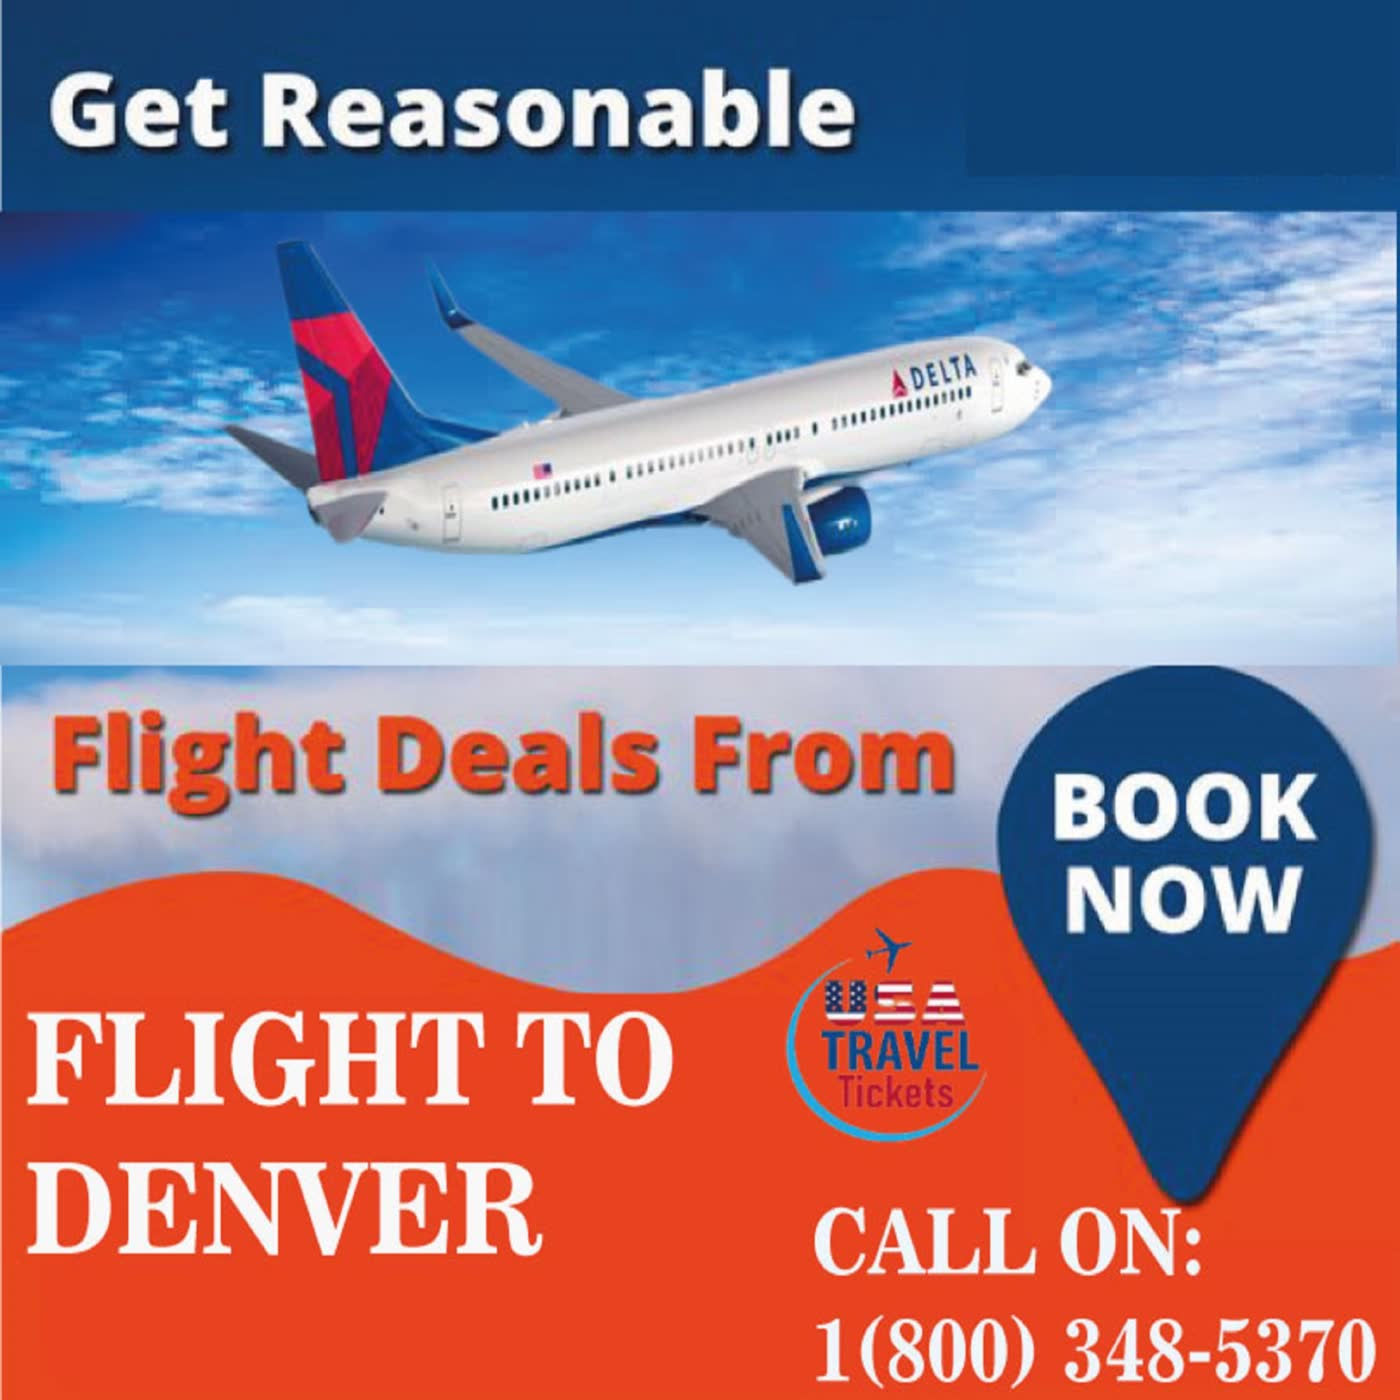 Flights to Denver (800) 348-5370 Delta Airlines